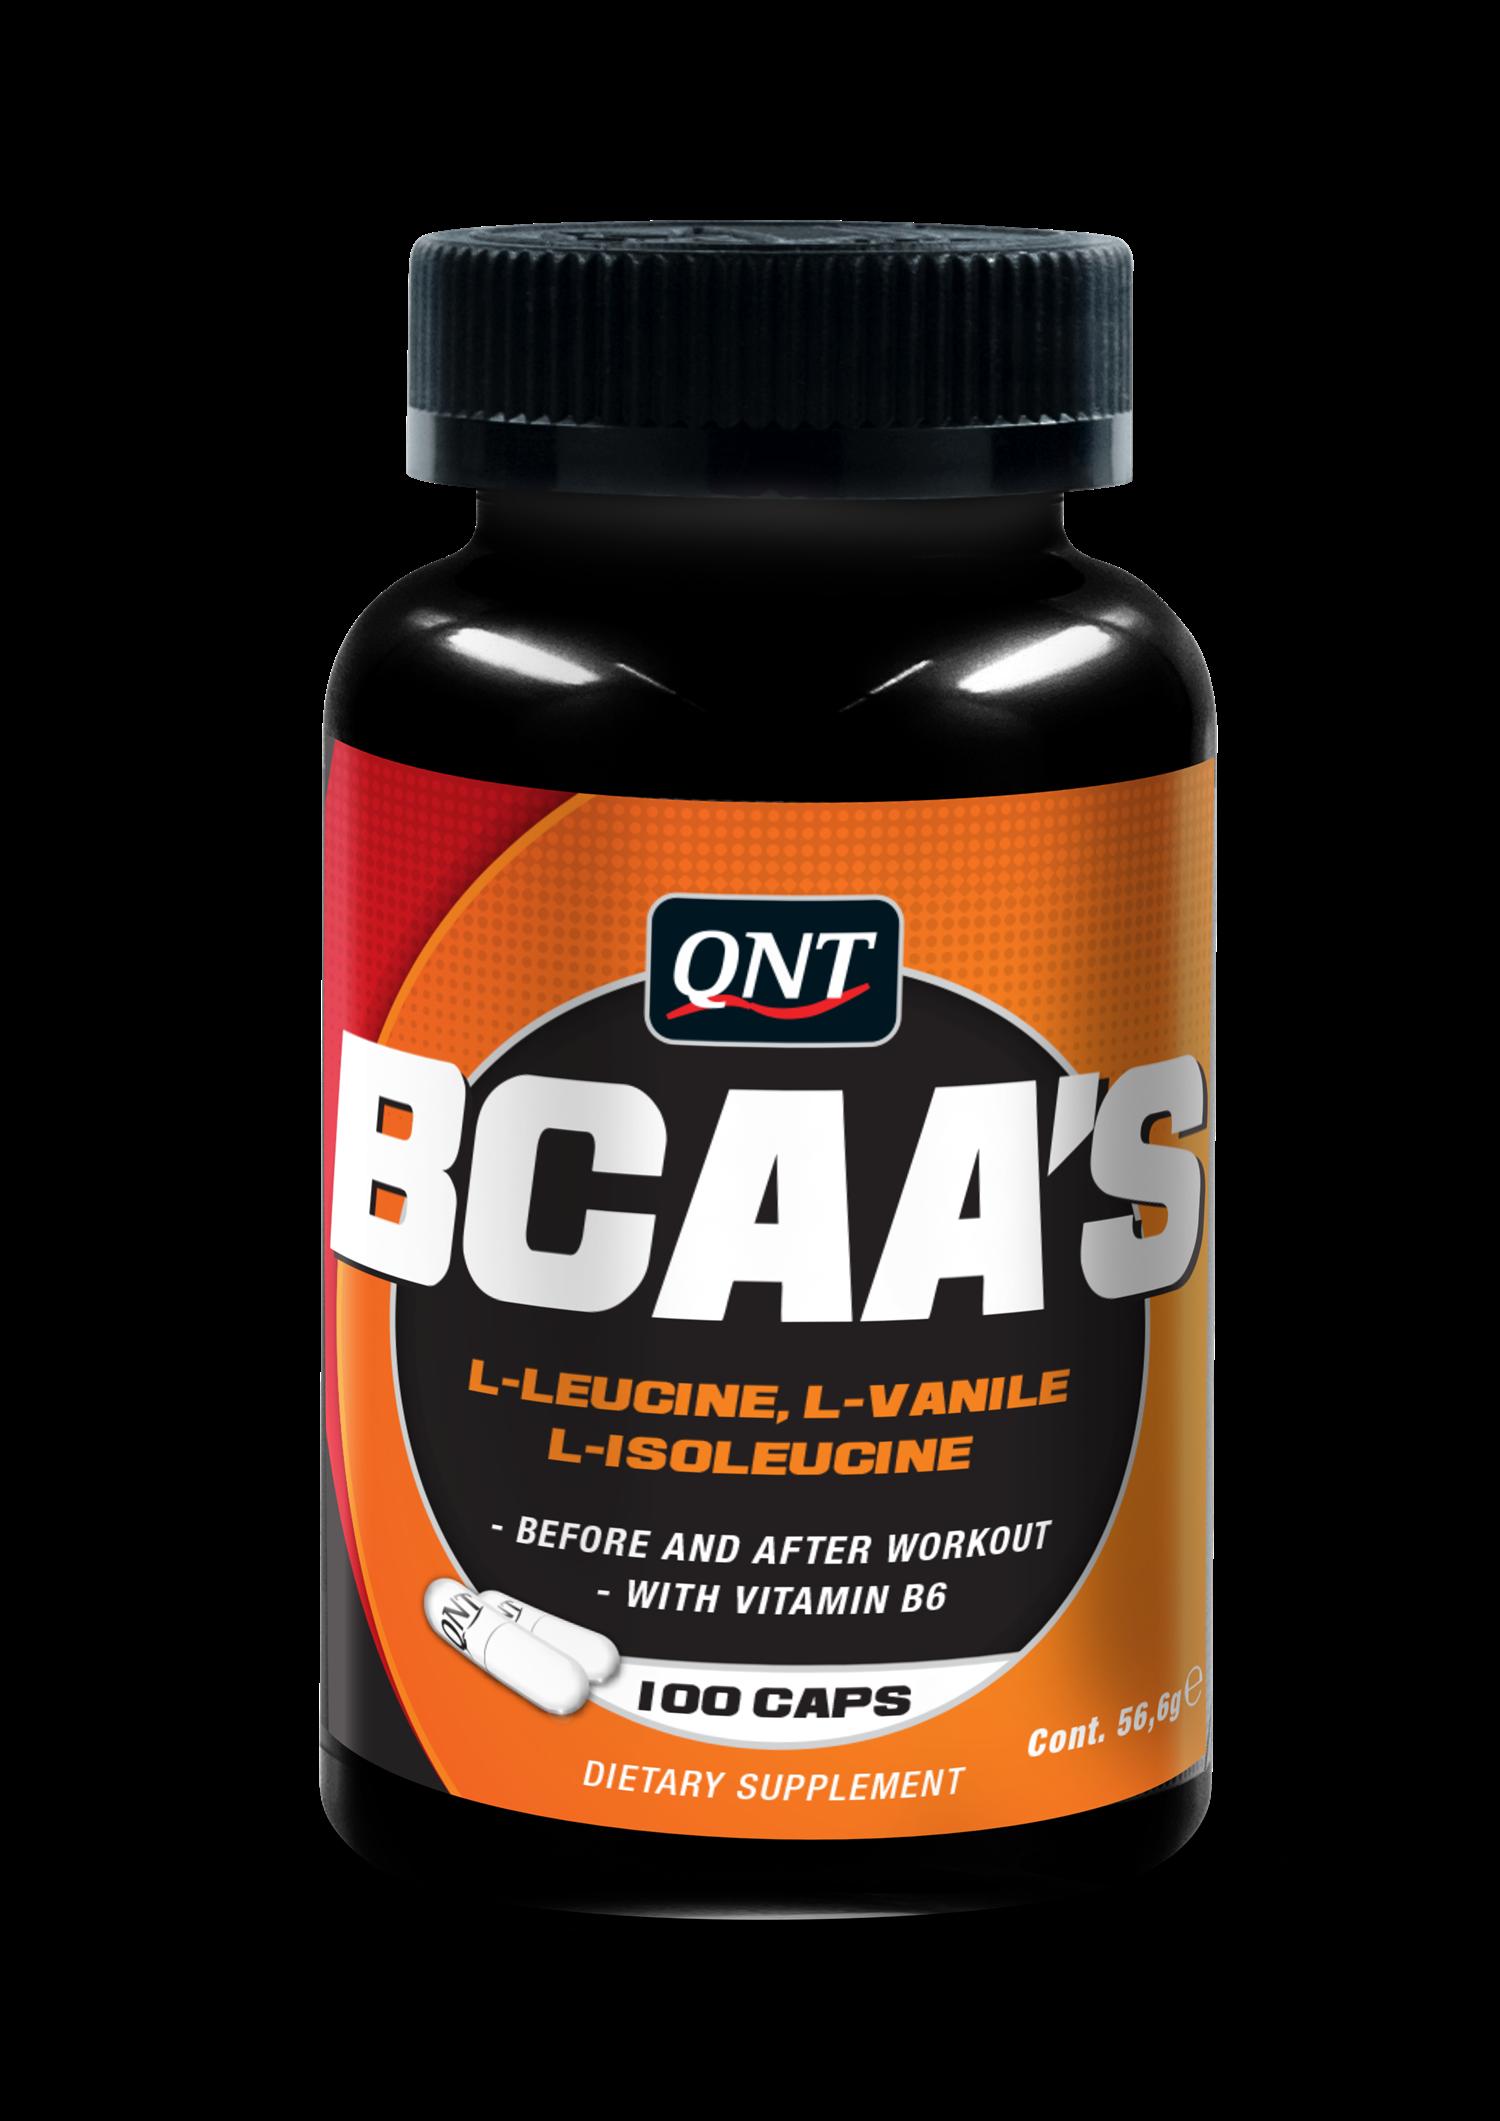 QNT BCAA's + Vitamine B6 - 100 caps